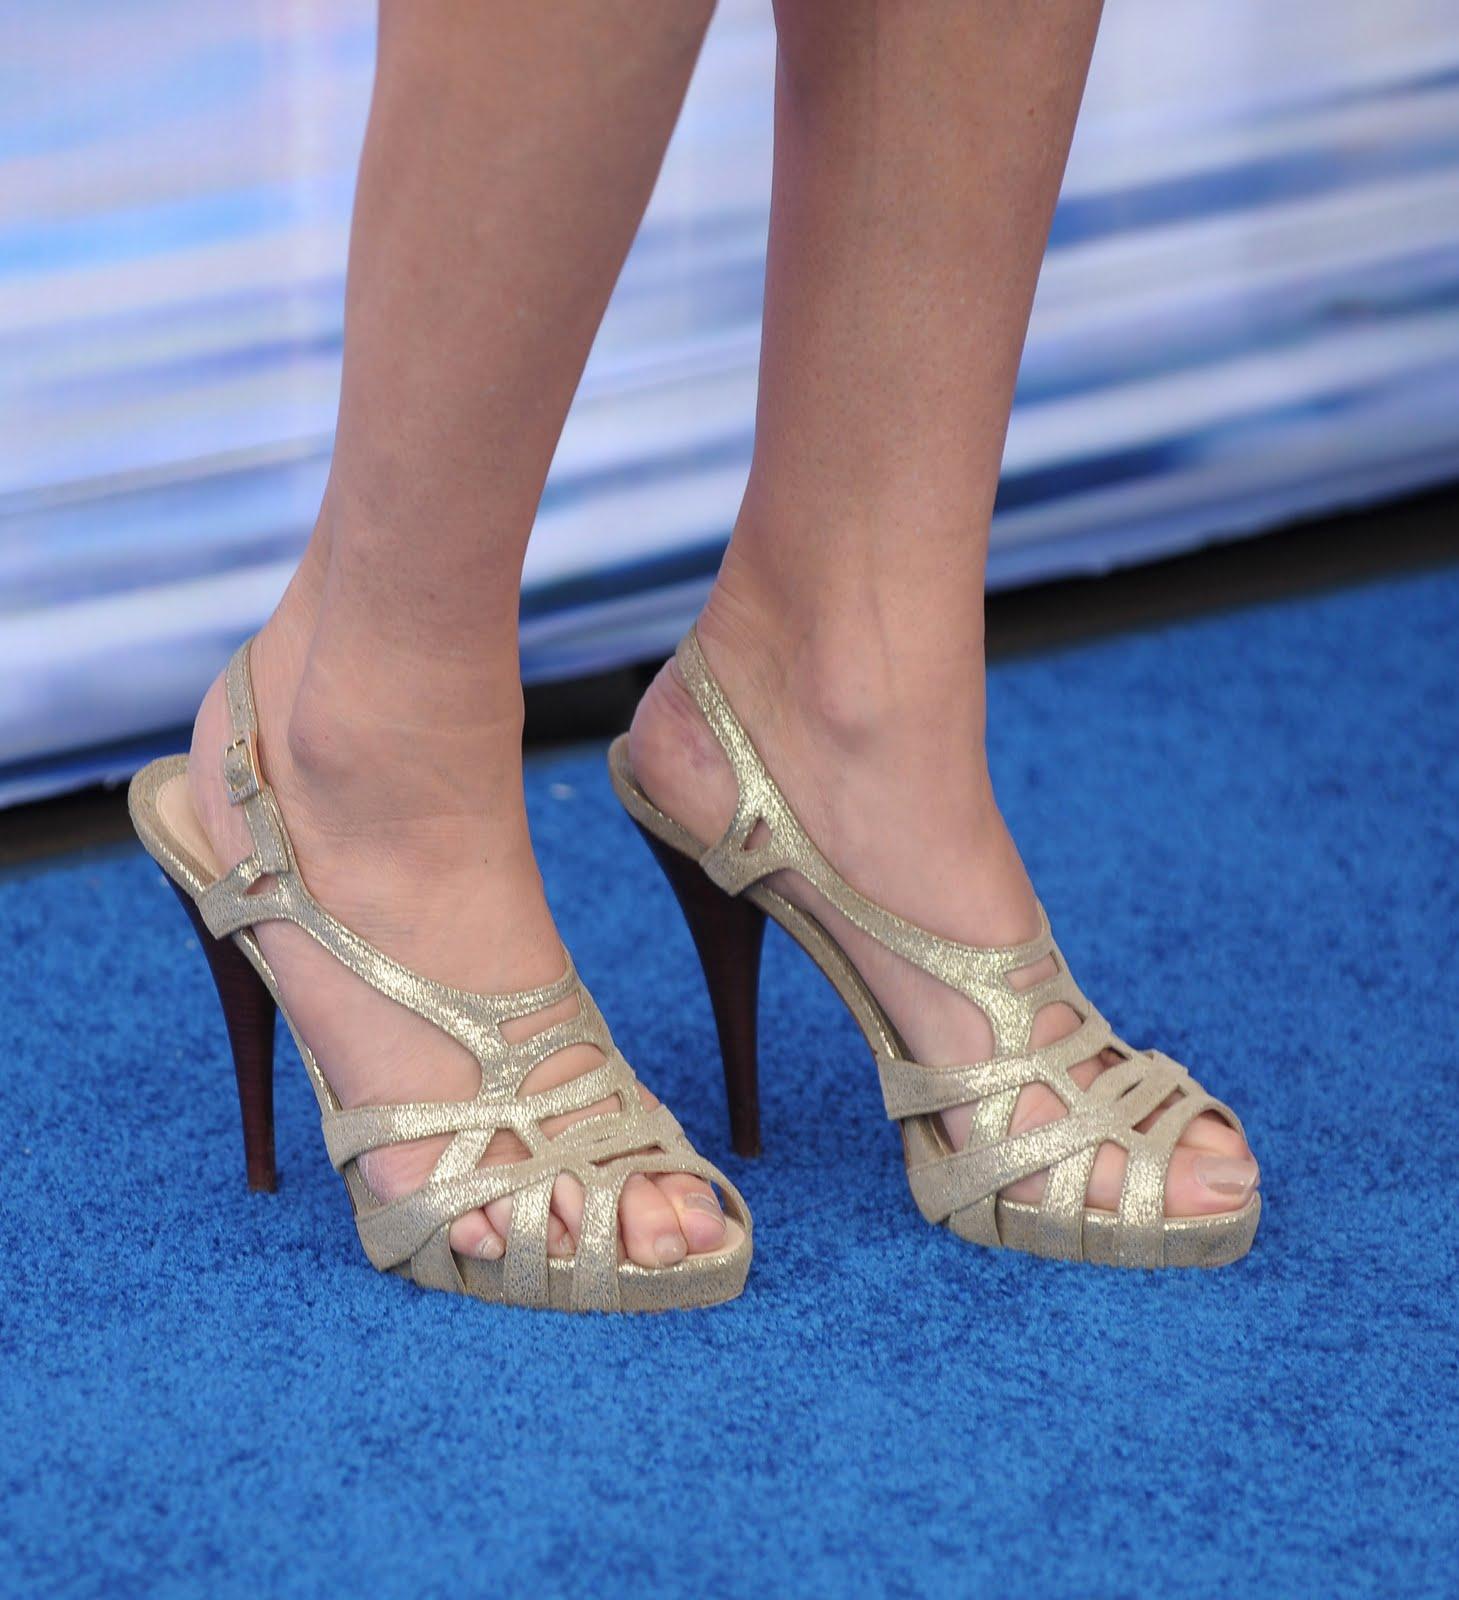 http://1.bp.blogspot.com/_UaLWp72nij4/TFM2OsmRr7I/AAAAAAAASrw/JRyYmr36RXA/s1600/teri-hatcher-feet-pic.jpg